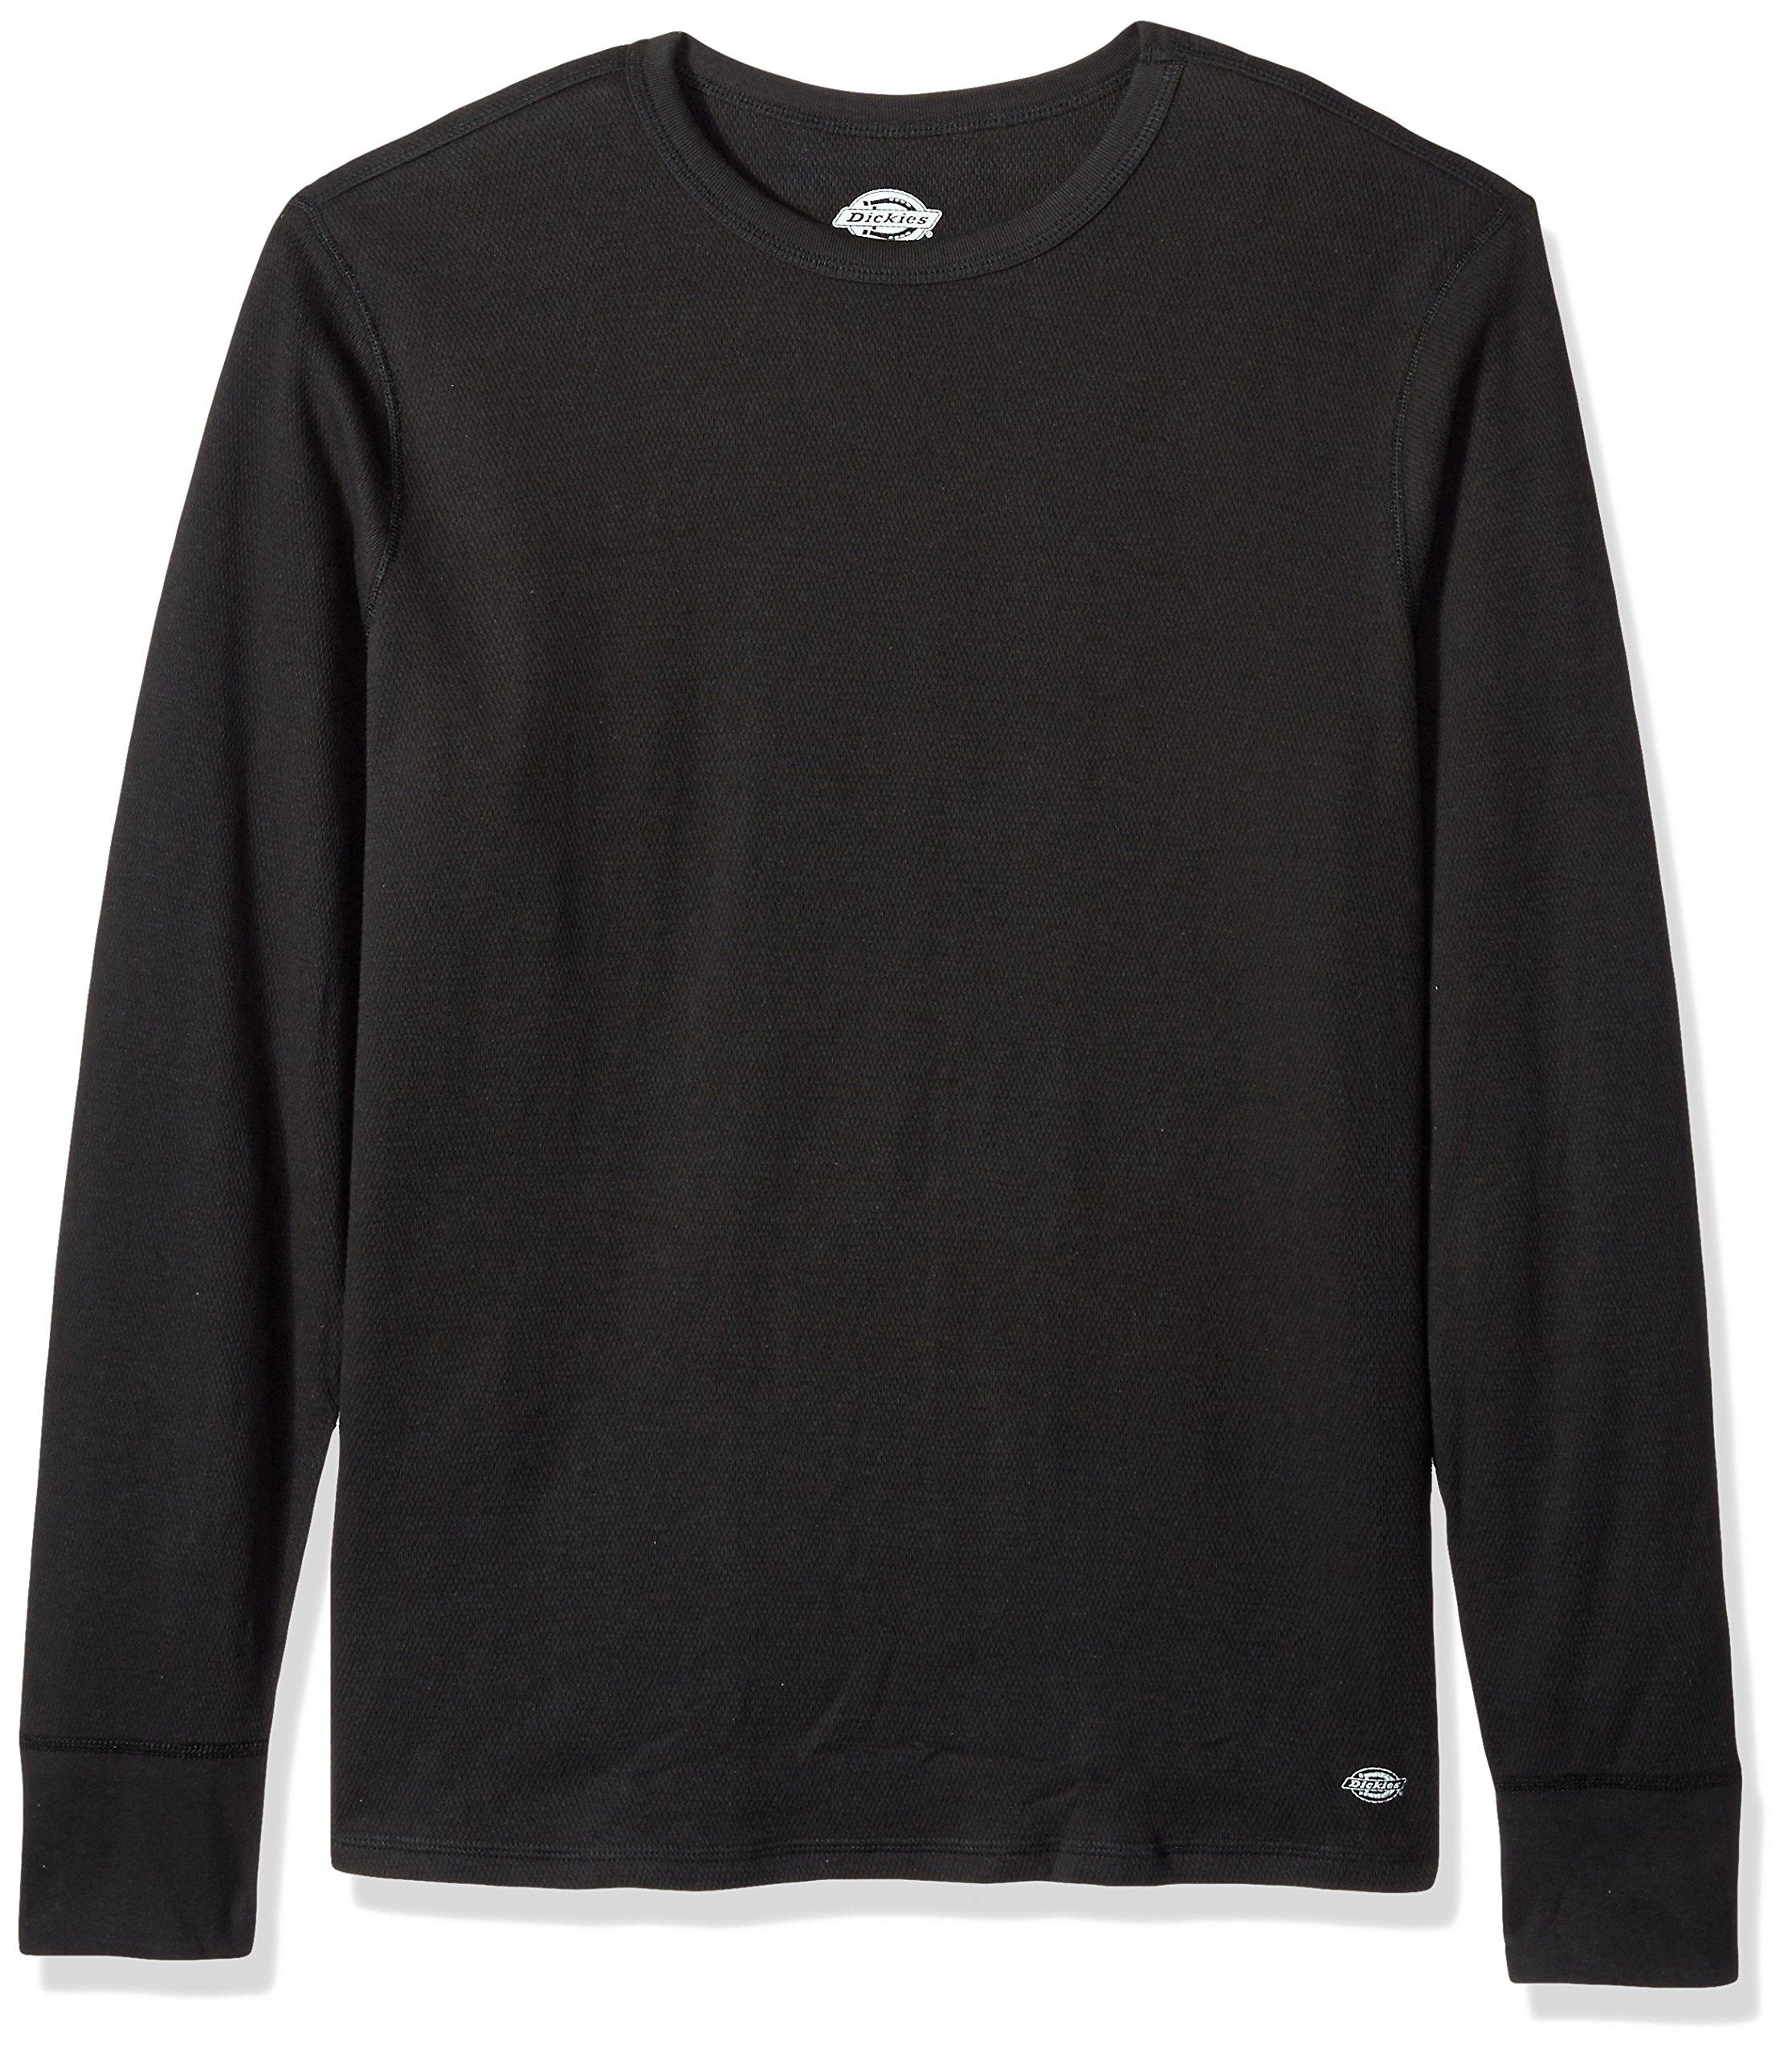 Dickies Men's Heavyweight Cotton Thermal Top, Black, Large by Dickies